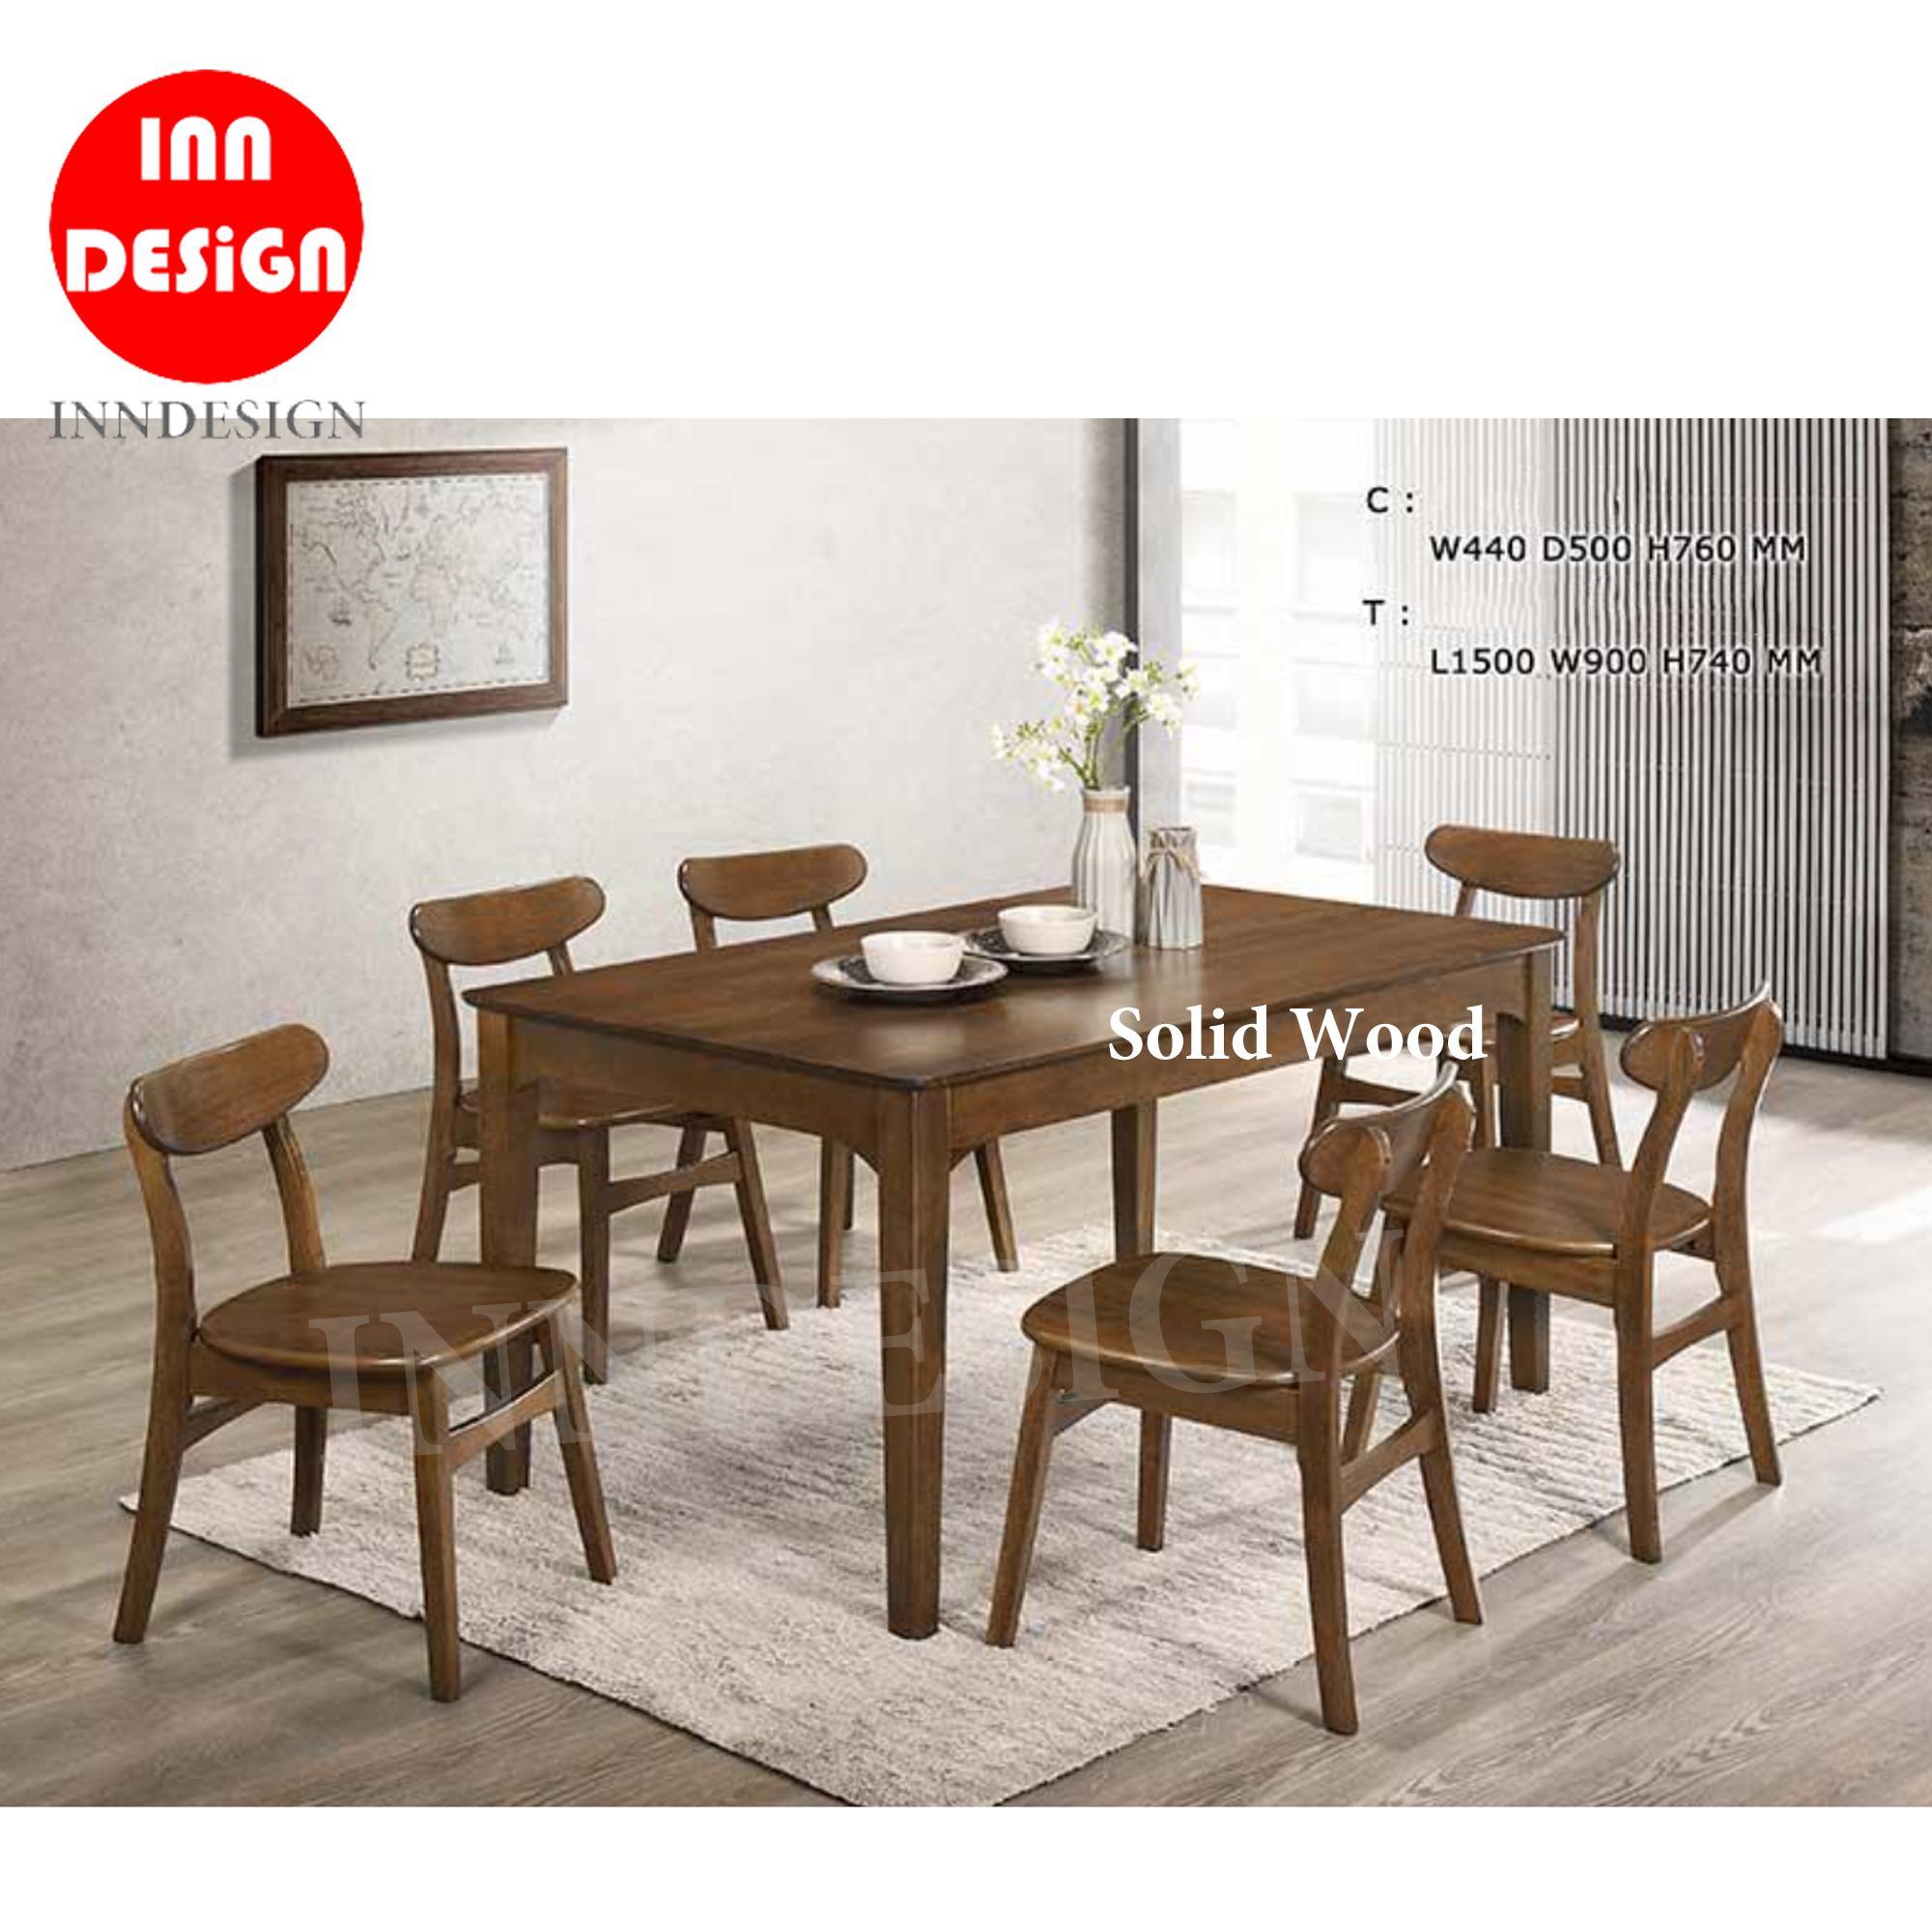 Hamis 1+6 Dining Set (100% Solid Wood) (Free Installation)